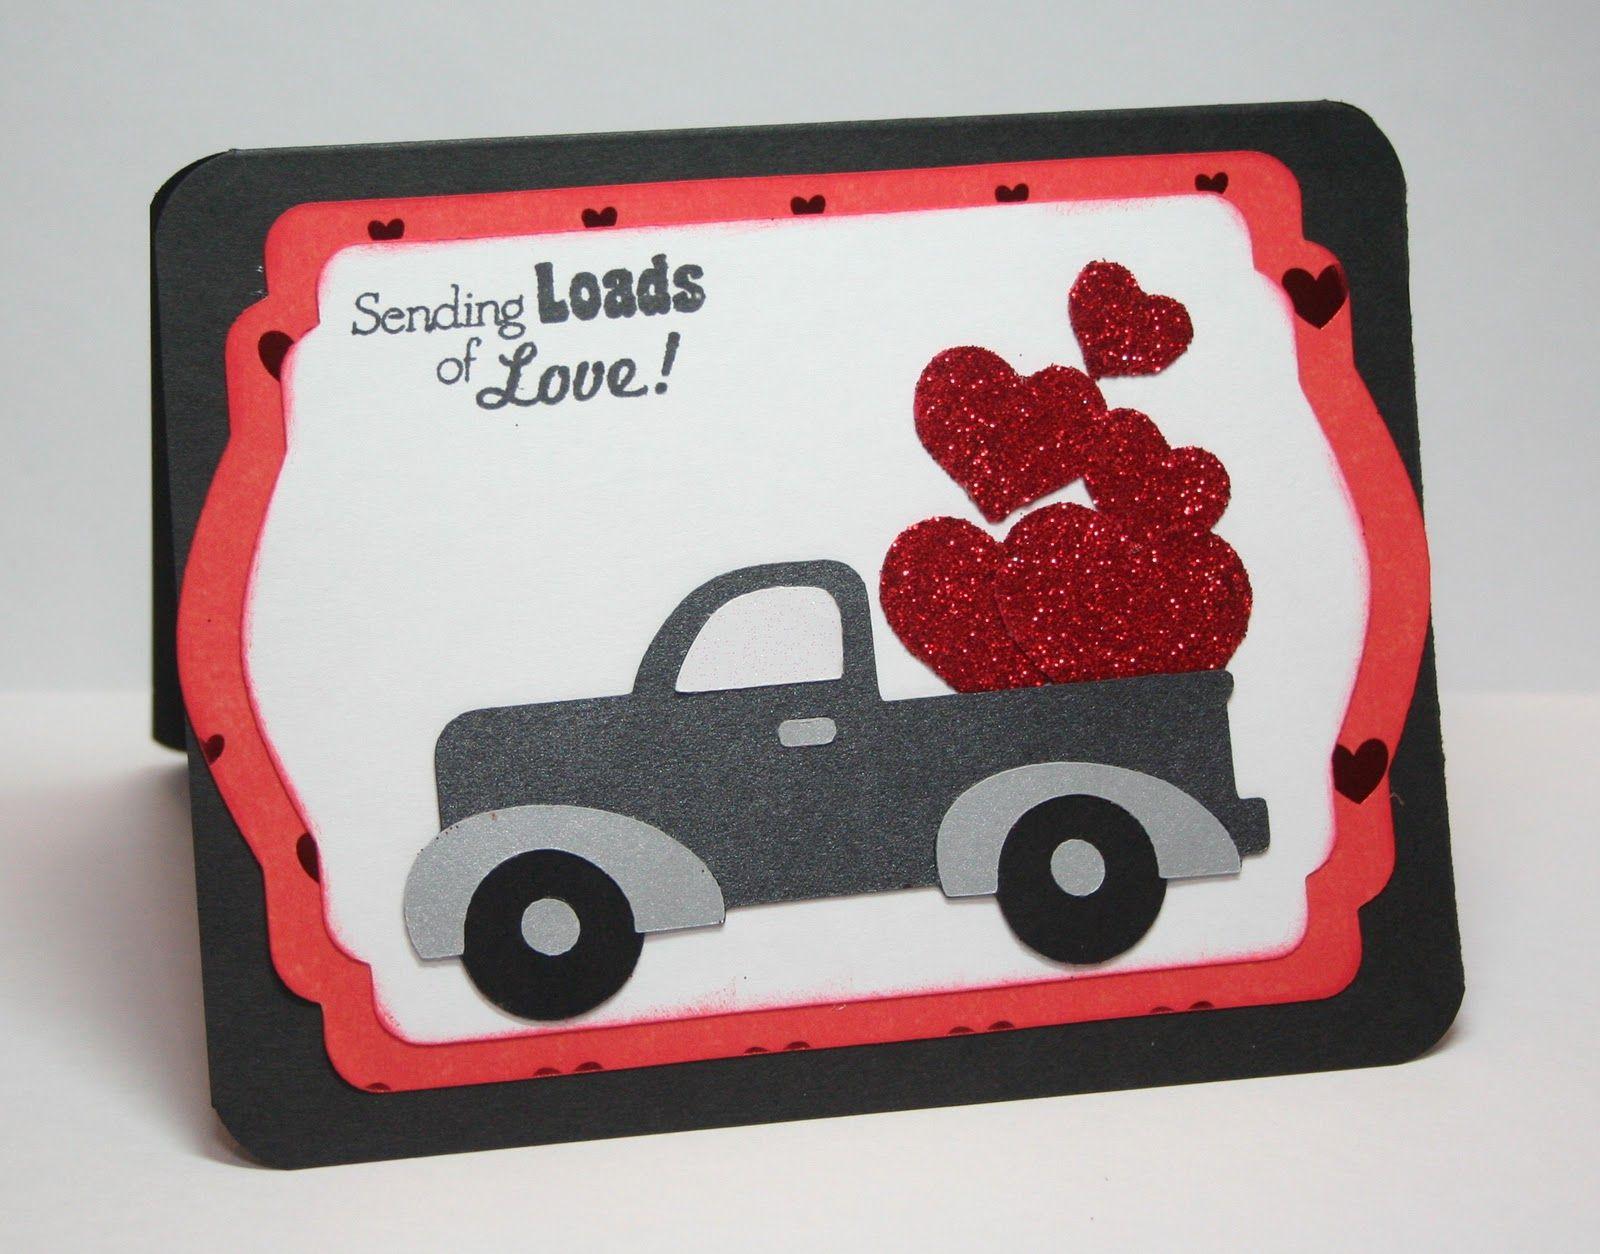 Valentines Cards Using The Cricut Cricut Cardz Challenge Is To